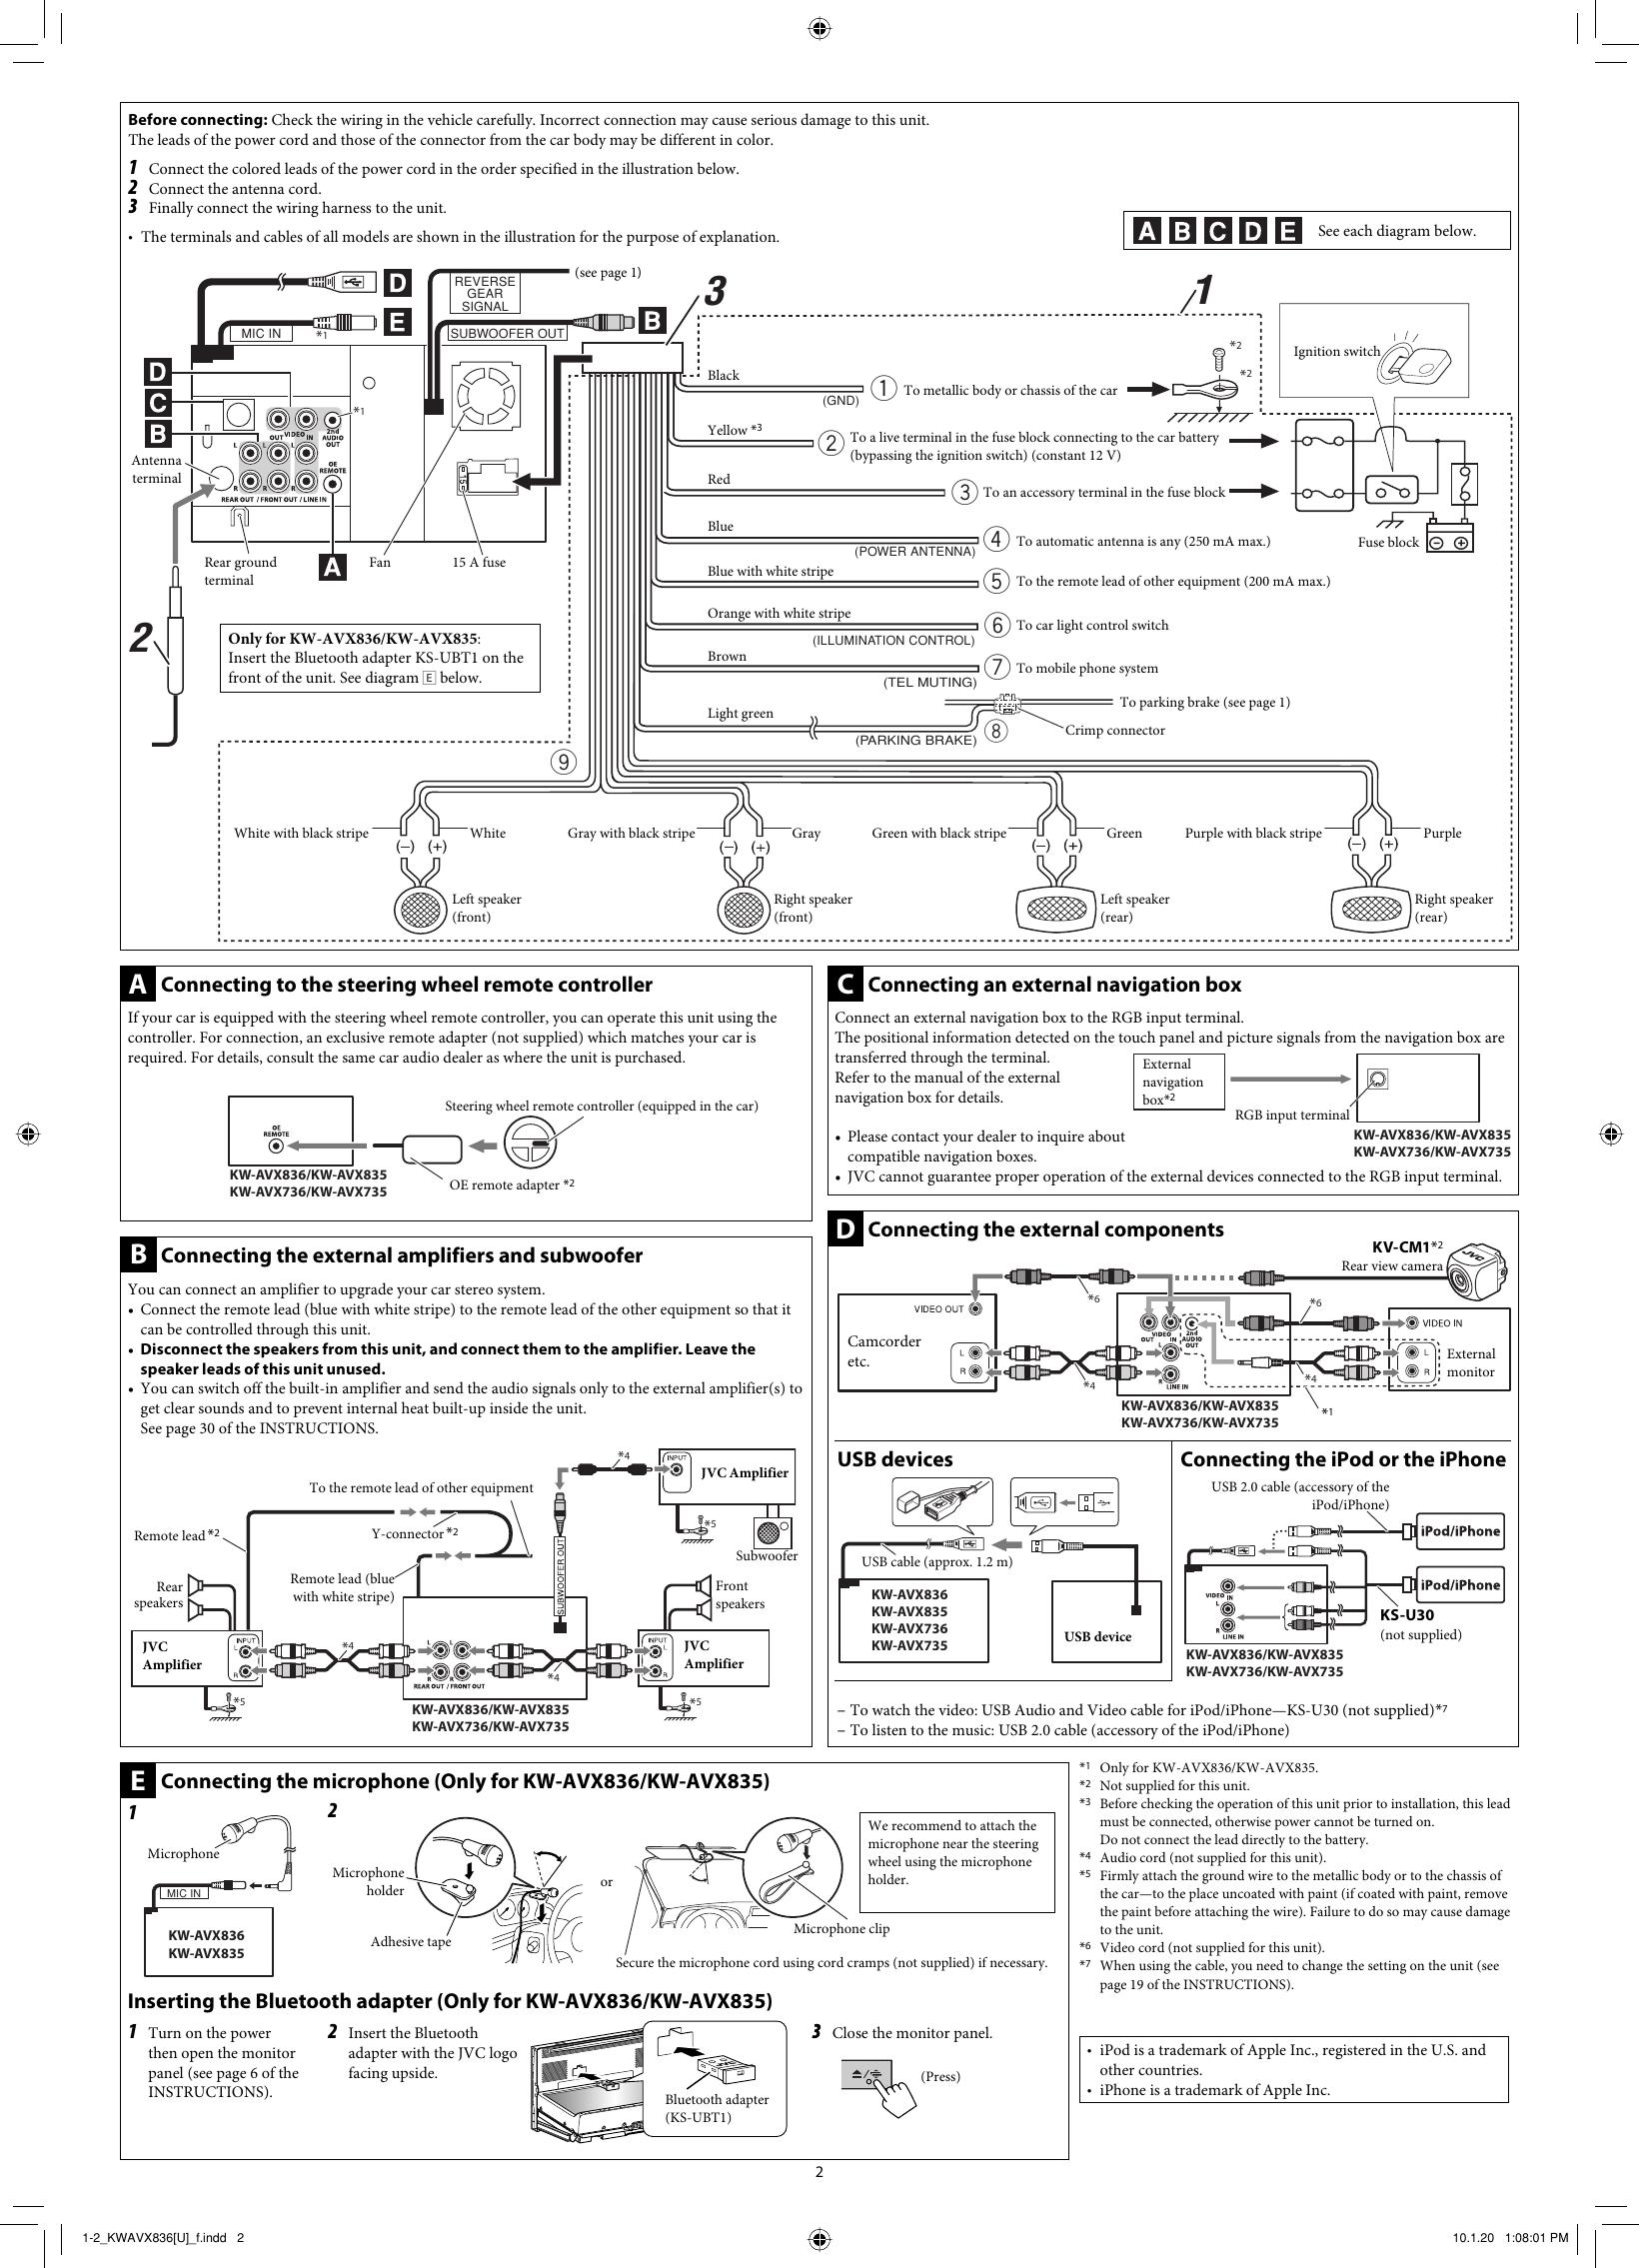 Jvc Kw R500 Wiring Harness Diagram - Wiring Diagrams Digital Kw Wiring Diagram on pa wiring diagram, ge wiring diagram, ac wiring diagram, gm wiring diagram, sd wiring diagram, mg wiring diagram, st wiring diagram, jp wiring diagram, tj wiring diagram, hp wiring diagram, ag wiring diagram, td wiring diagram, ml wiring diagram, cm wiring diagram, sh wiring diagram, dj wiring diagram, ae wiring diagram, cr wiring diagram, sg wiring diagram, tv wiring diagram,